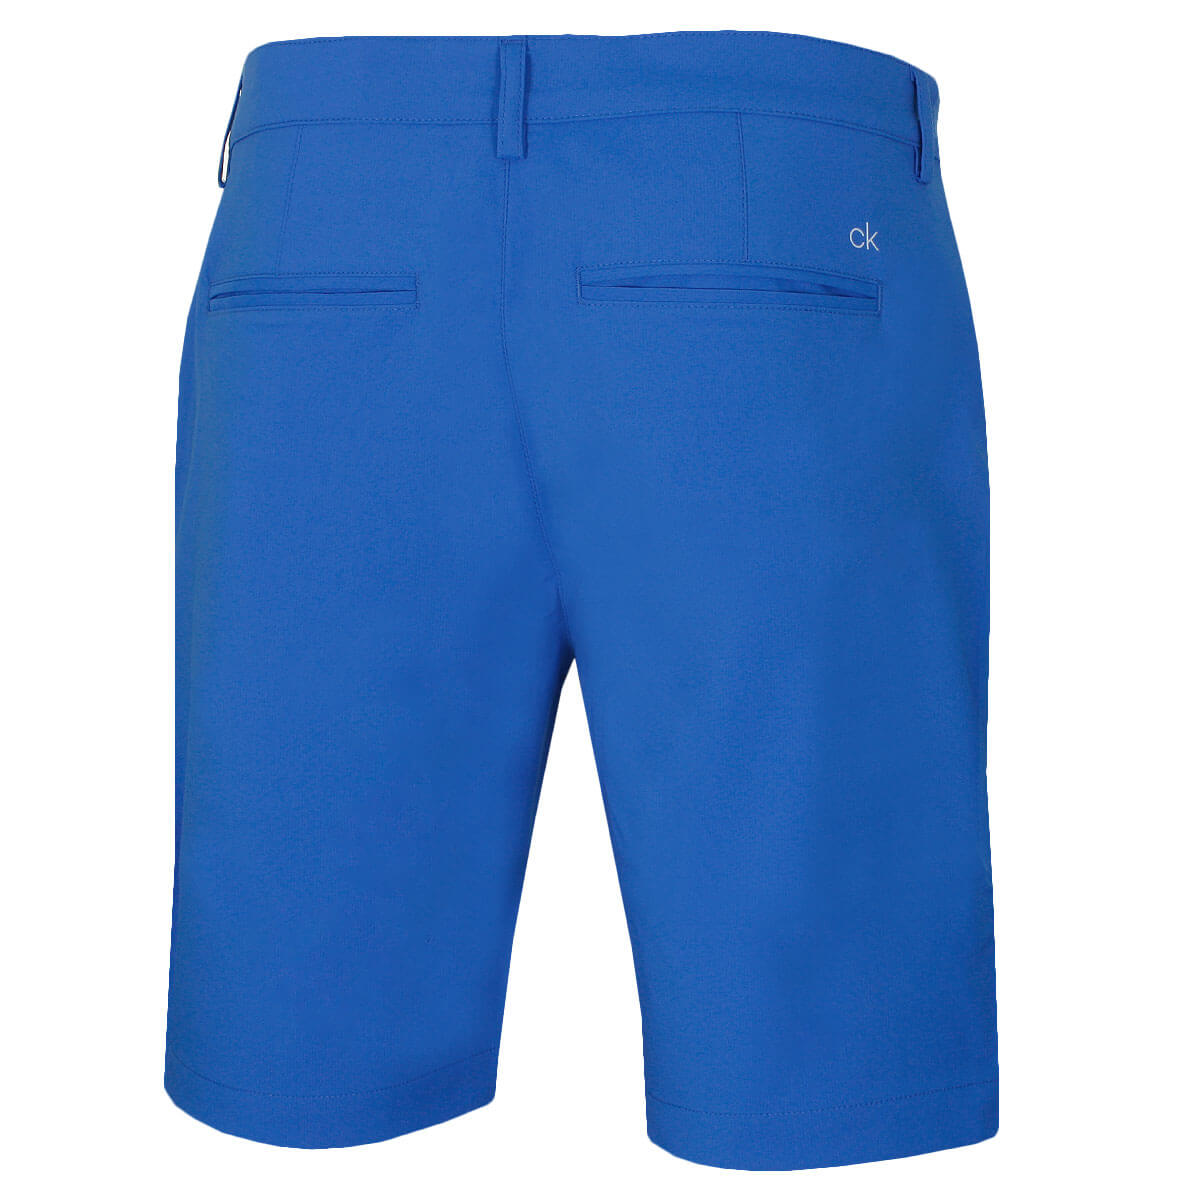 thumbnail 6 - Calvin Klein Mens 2021 Slim Fit Micro Tech Lightweight Golf Shorts 34% OFF RRP